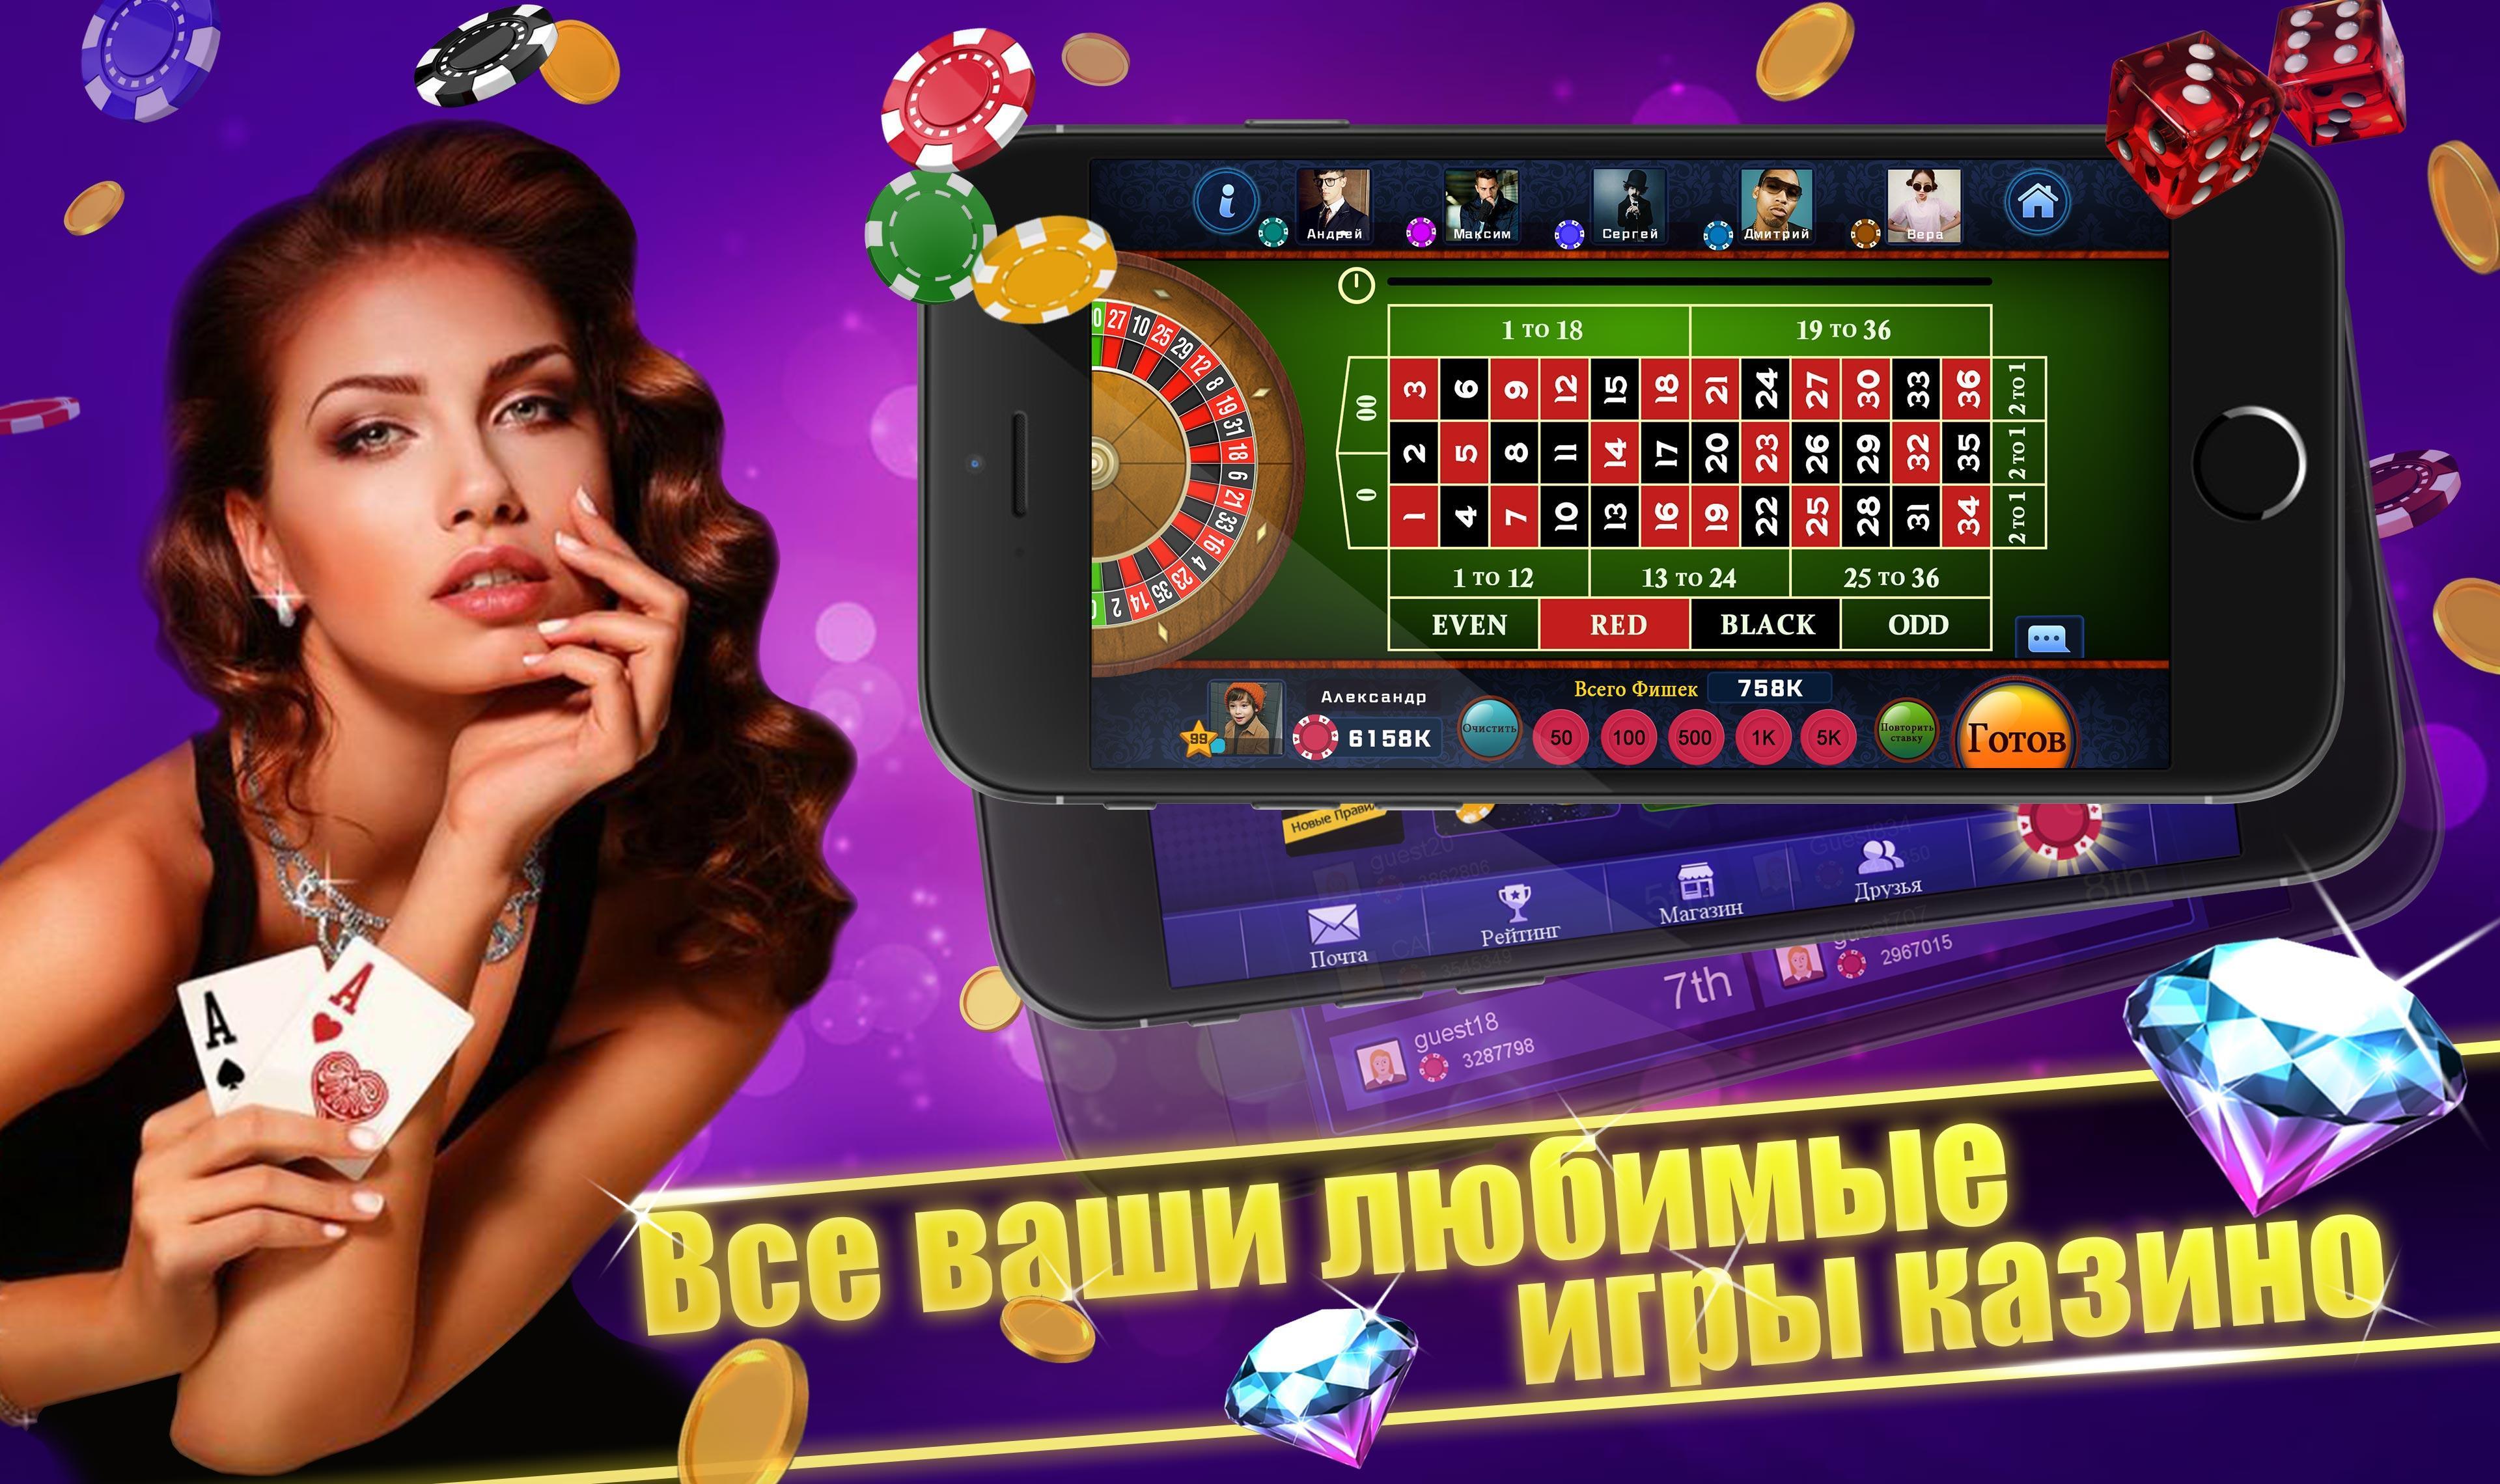 �гра казино, покер